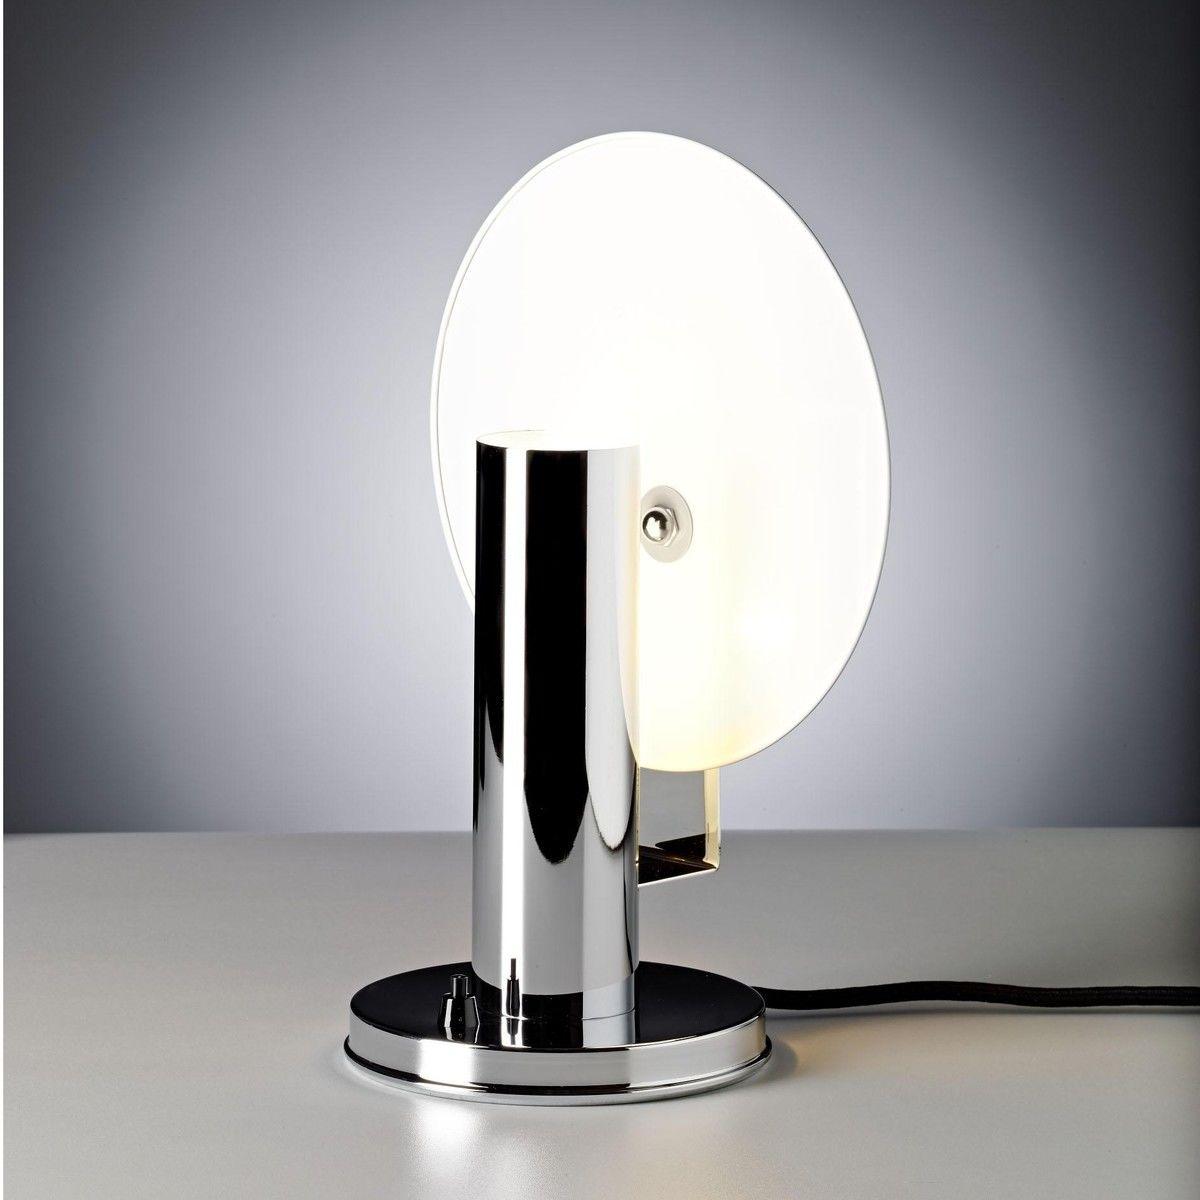 de stijl table lamp tecnolumen. Black Bedroom Furniture Sets. Home Design Ideas